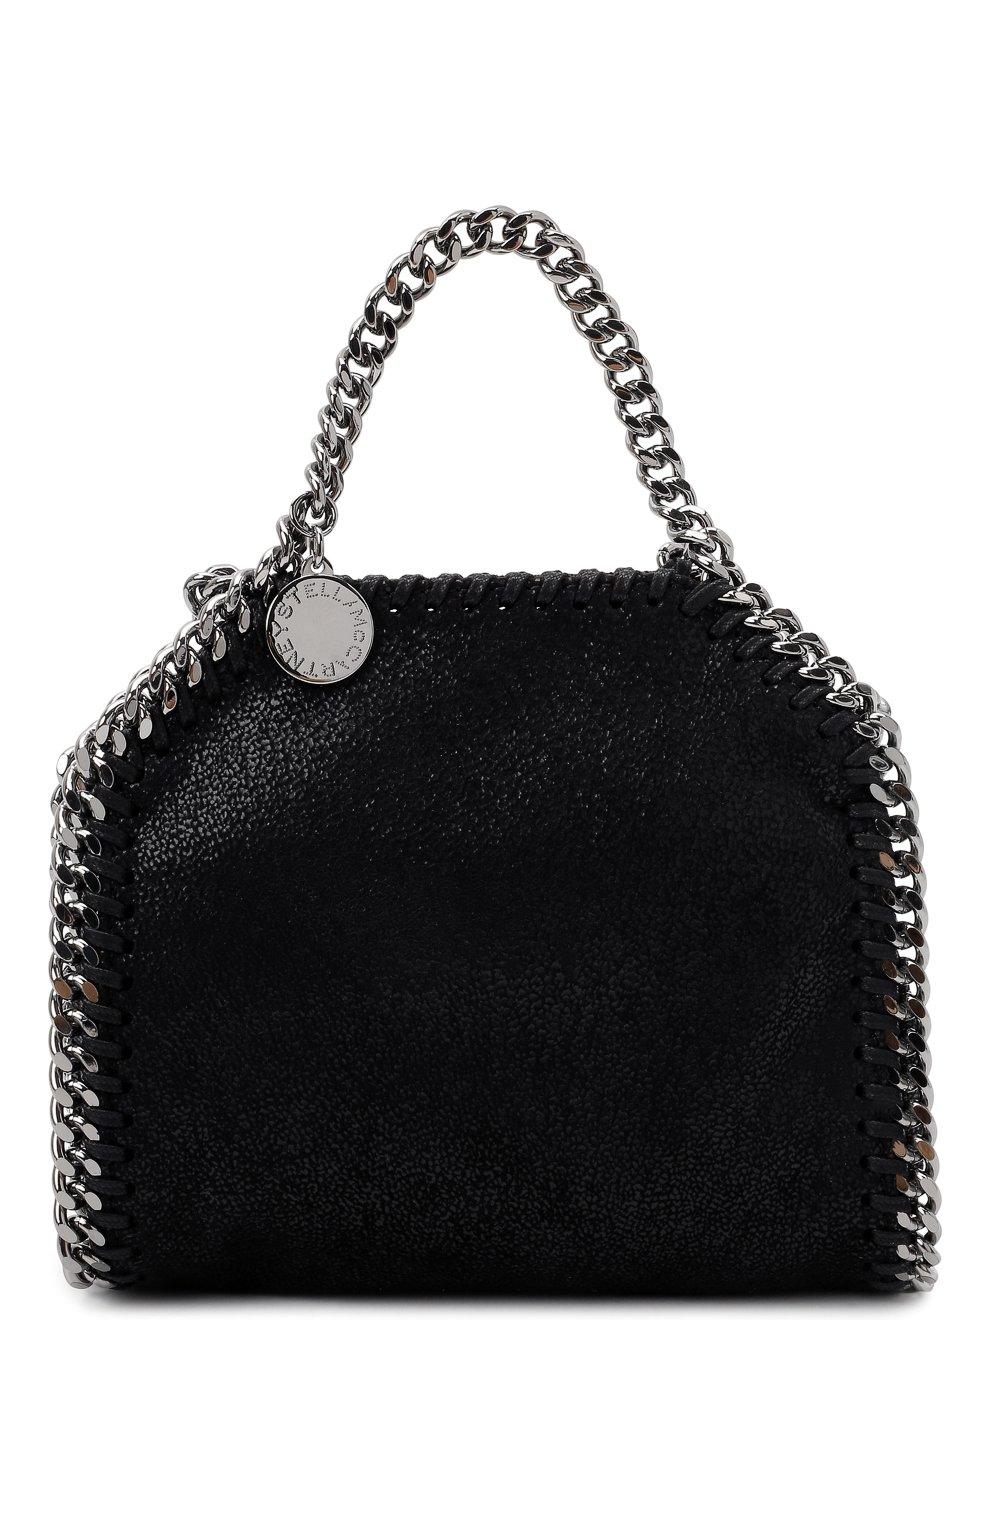 Женская сумка falabella STELLA MCCARTNEY черного цвета, арт. 700227/W9132   Фото 1 (Ремень/цепочка: С цепочкой; Сумки-технические: Сумки top-handle; Размер: mini; Материал: Текстиль)